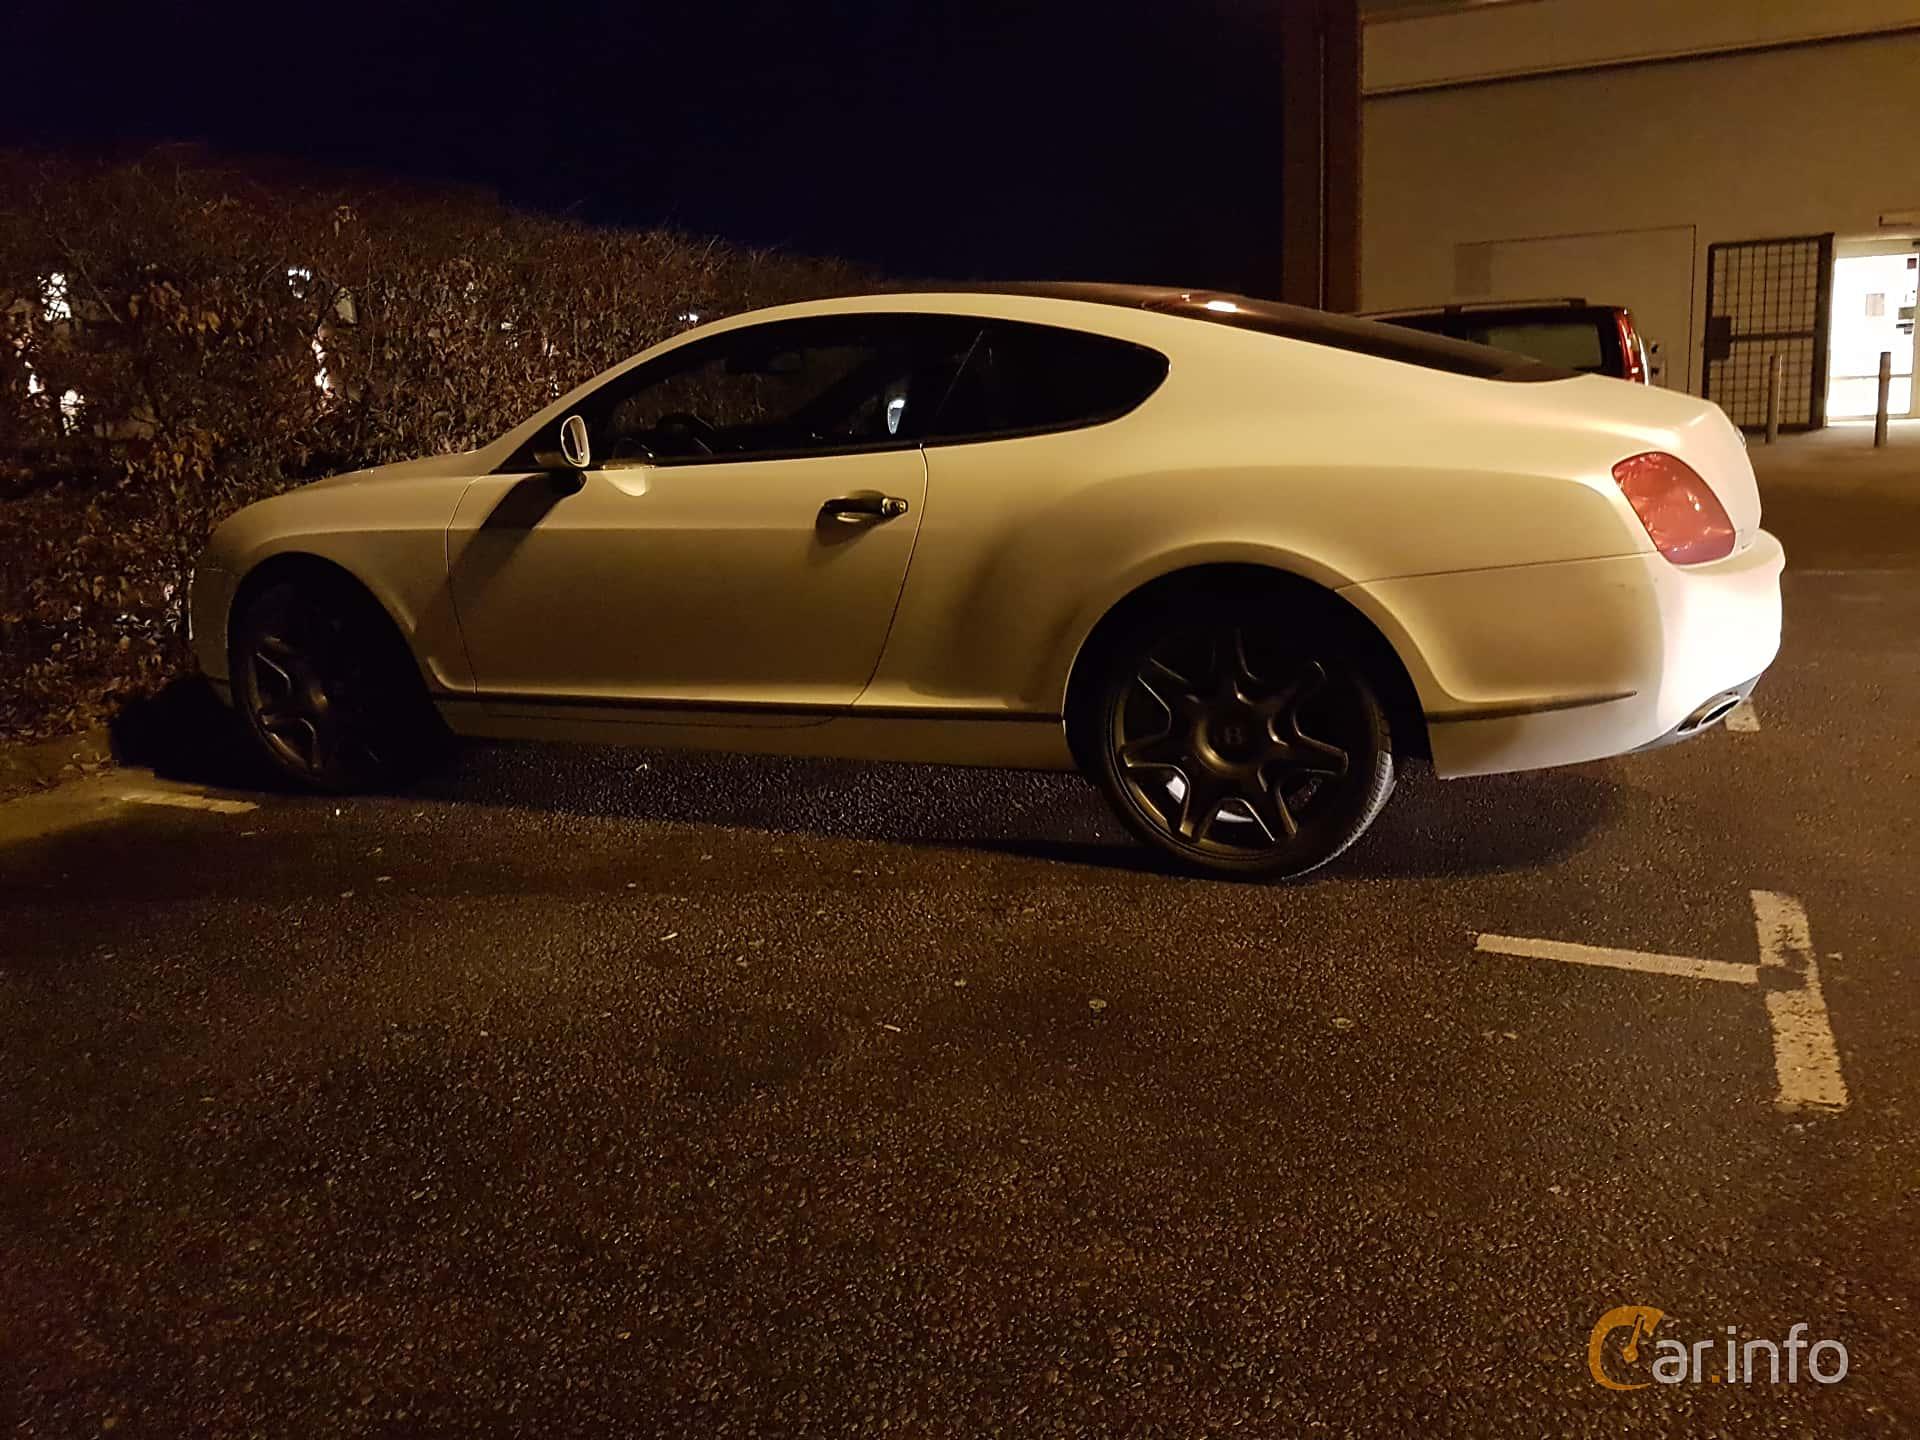 Bentley Continental GT 6.0 W12 Automatisk, 560hk, 2008